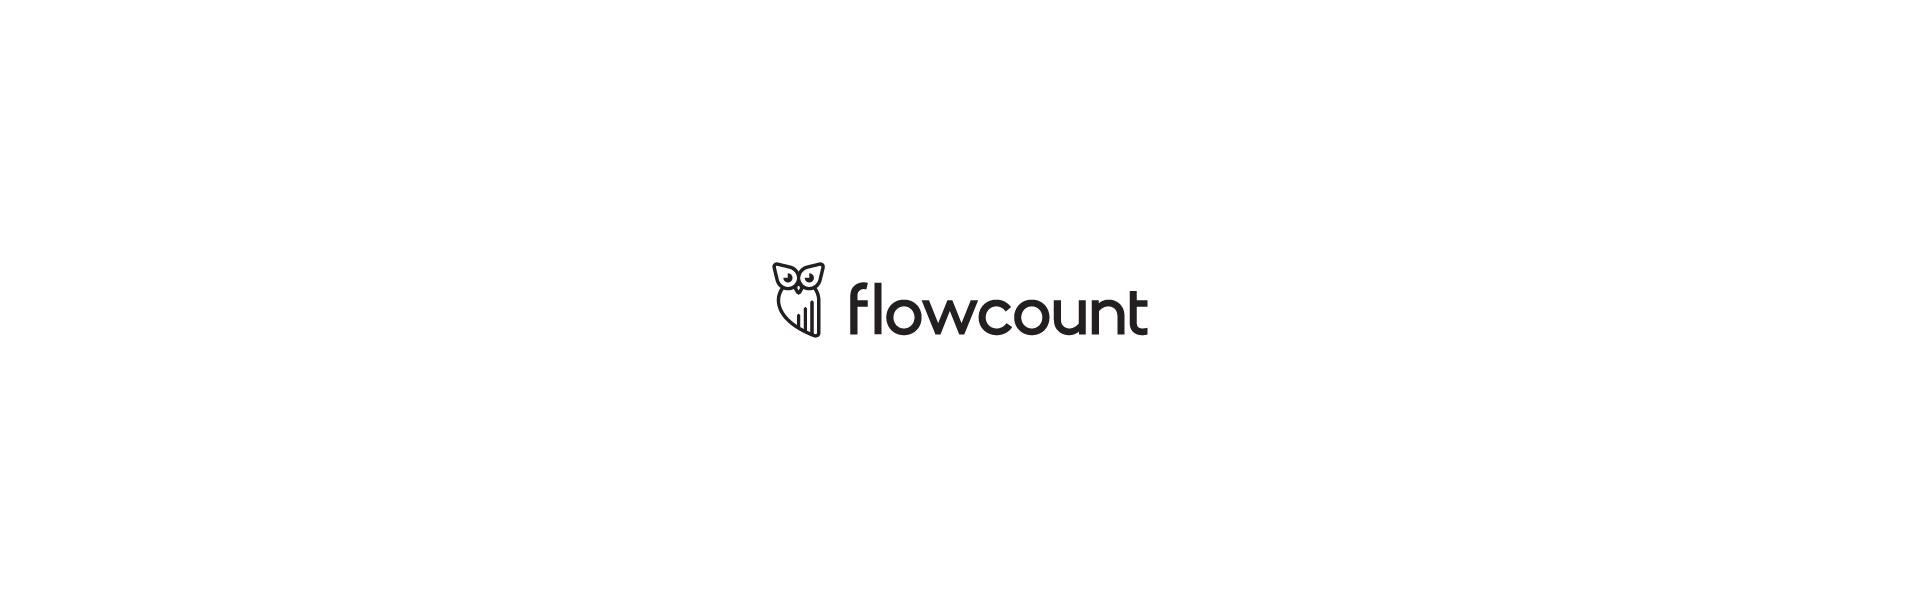 Flowcount Logo Design